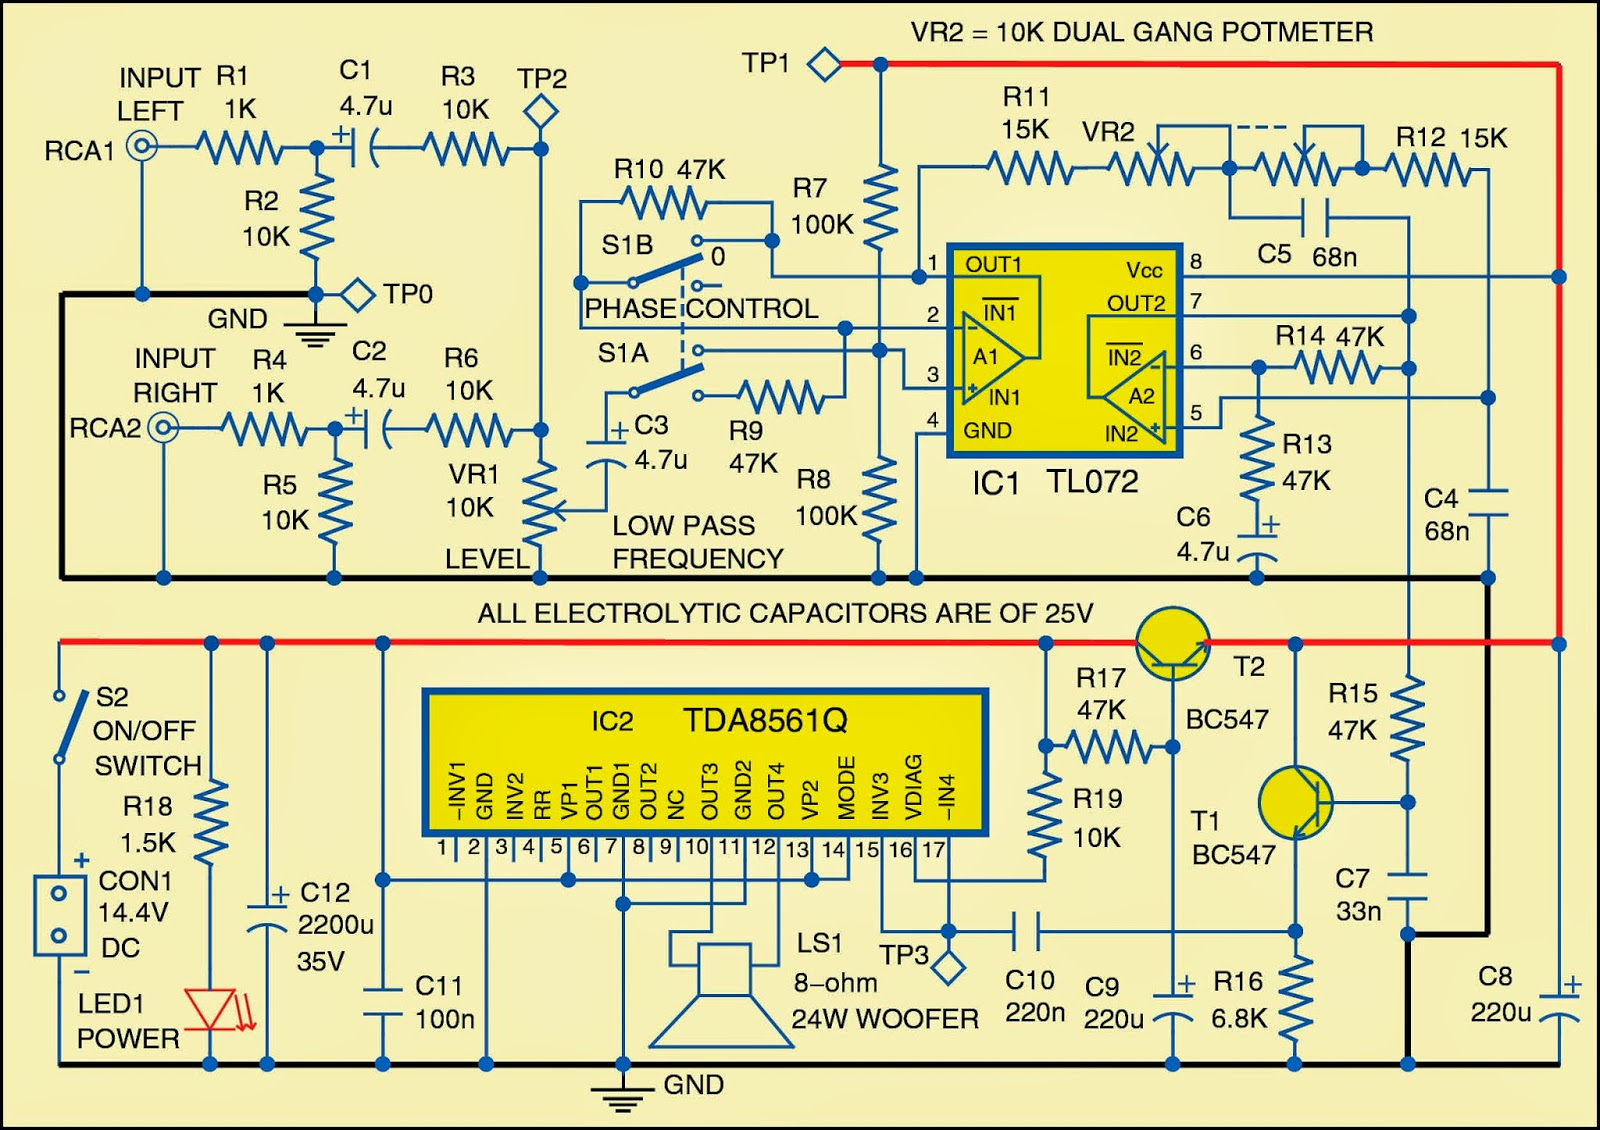 medium resolution of subwoofer for cars circuit diagram electronic circuits diagram circuit diagram of the subwoofer for cars